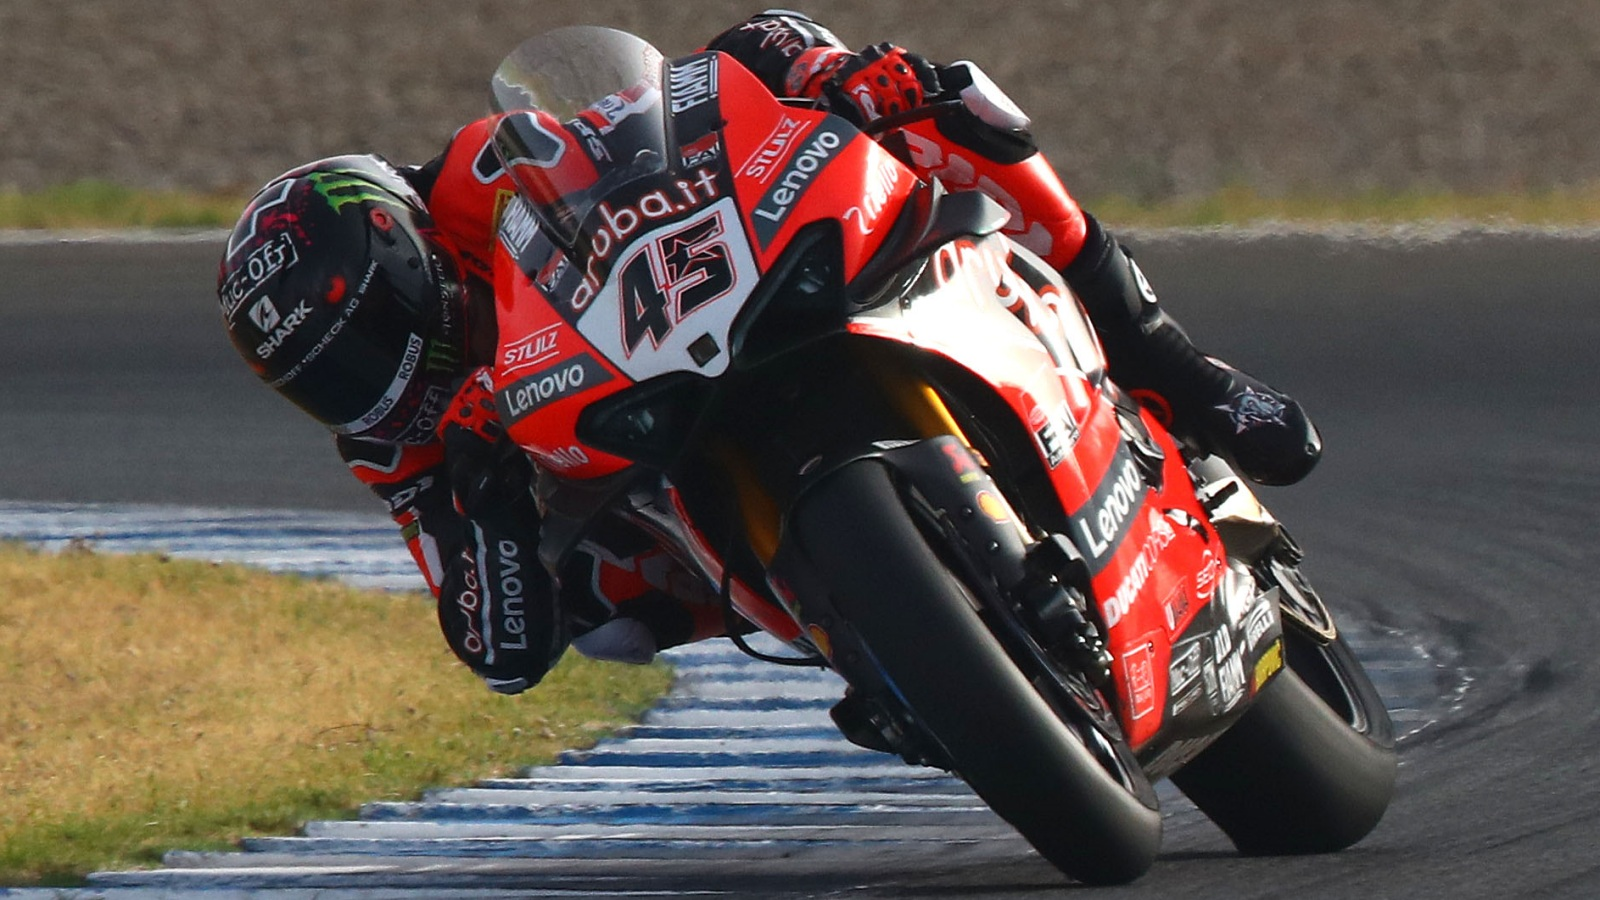 Scott Redding logra su primera victoria en Superbike batiendo a Jonathan Rea en Jerez